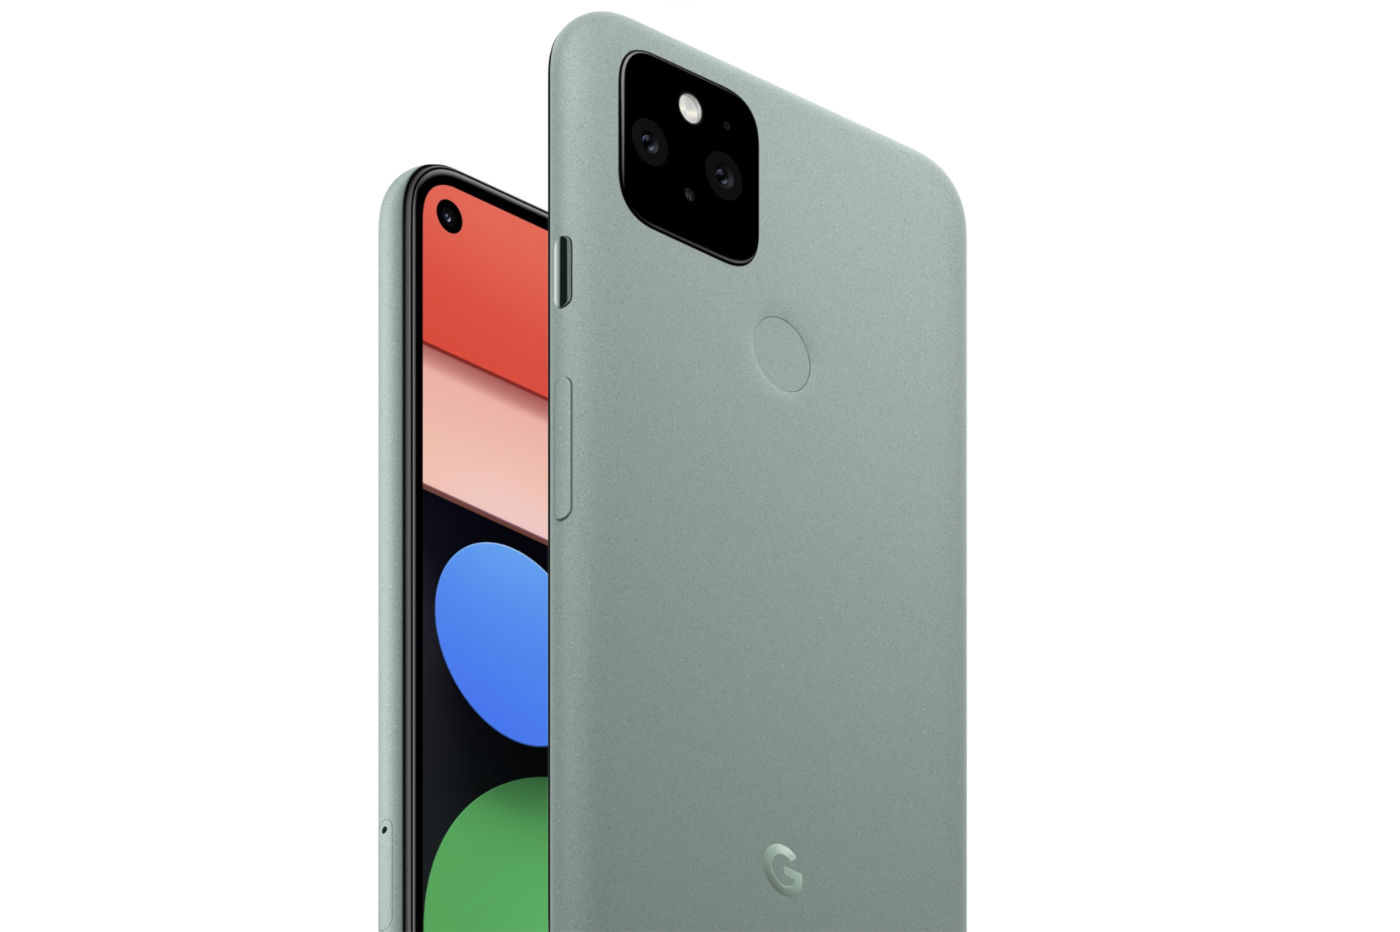 Meilleur prix Google Pixel 5